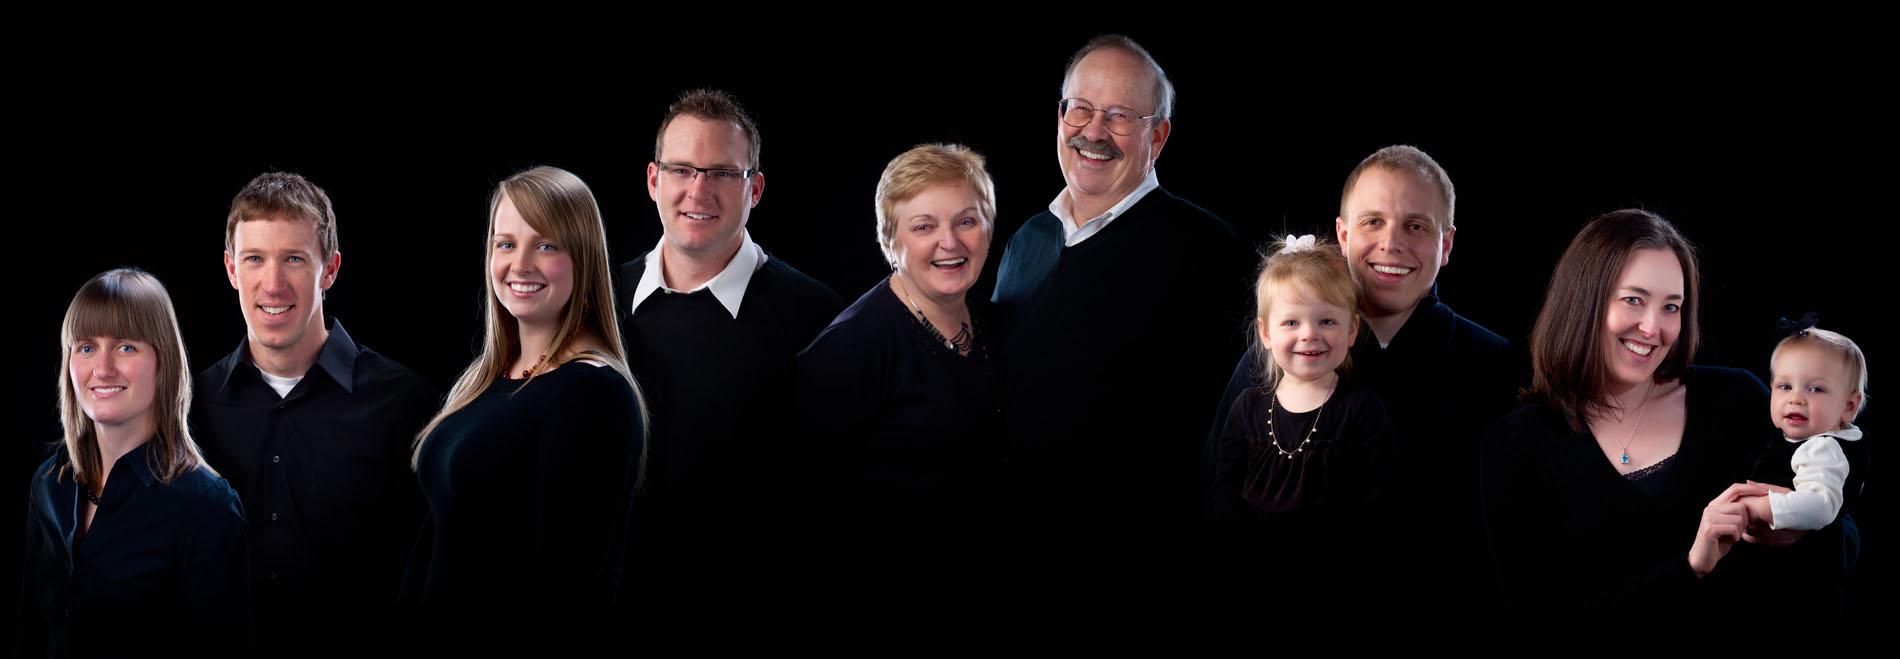 group photo on black